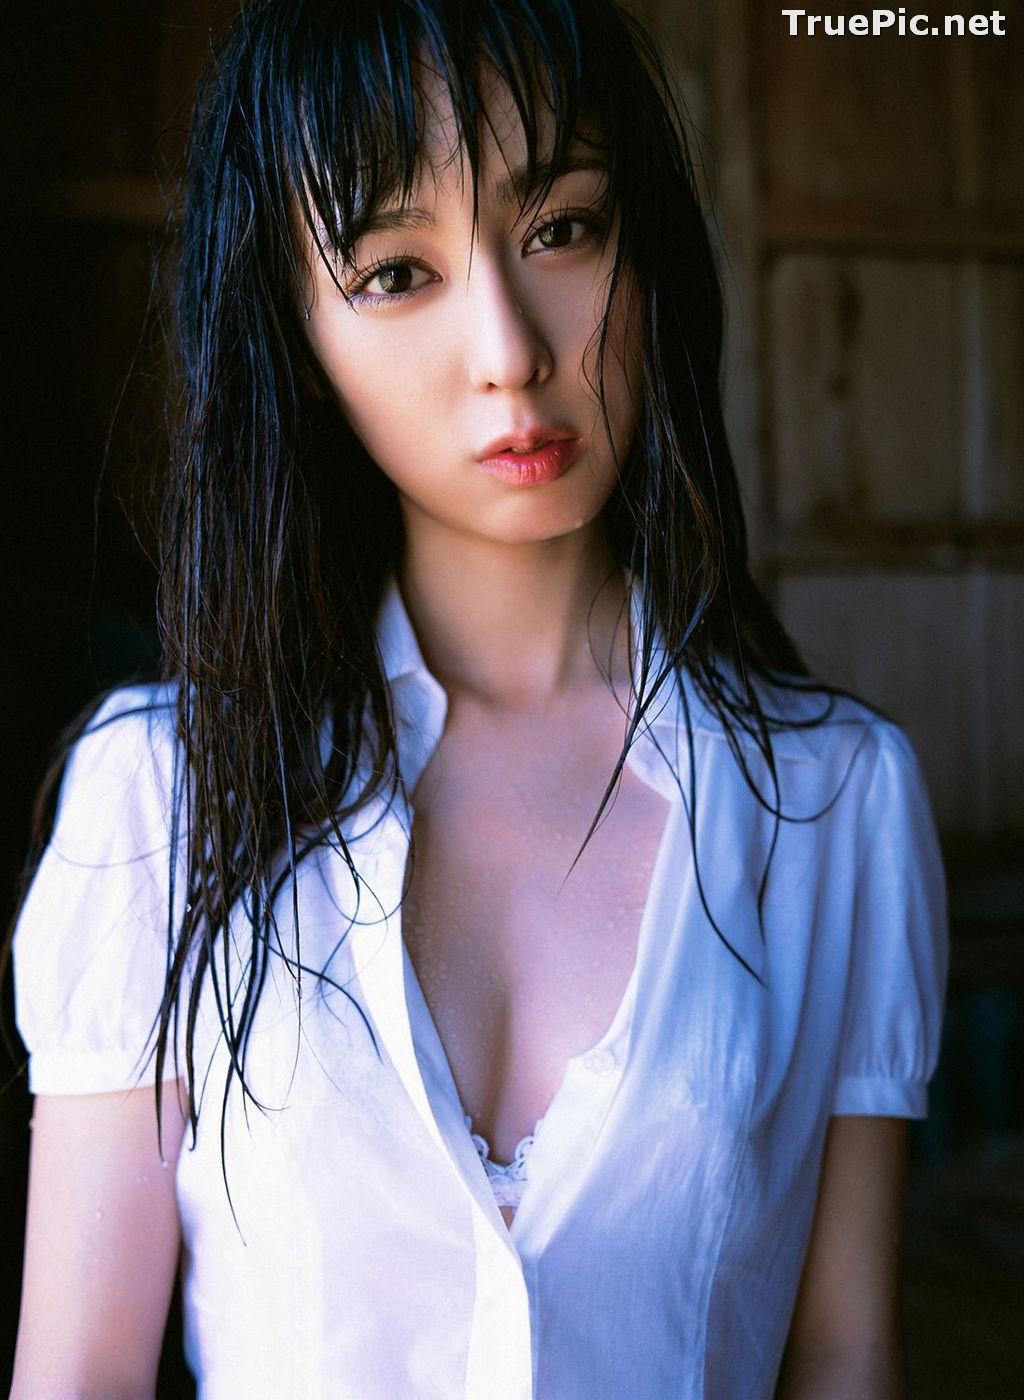 Image YS Web Vol.234 - Japanese Actress and Gravure Idol – Rina Akiyama - TruePic.net - Picture-9